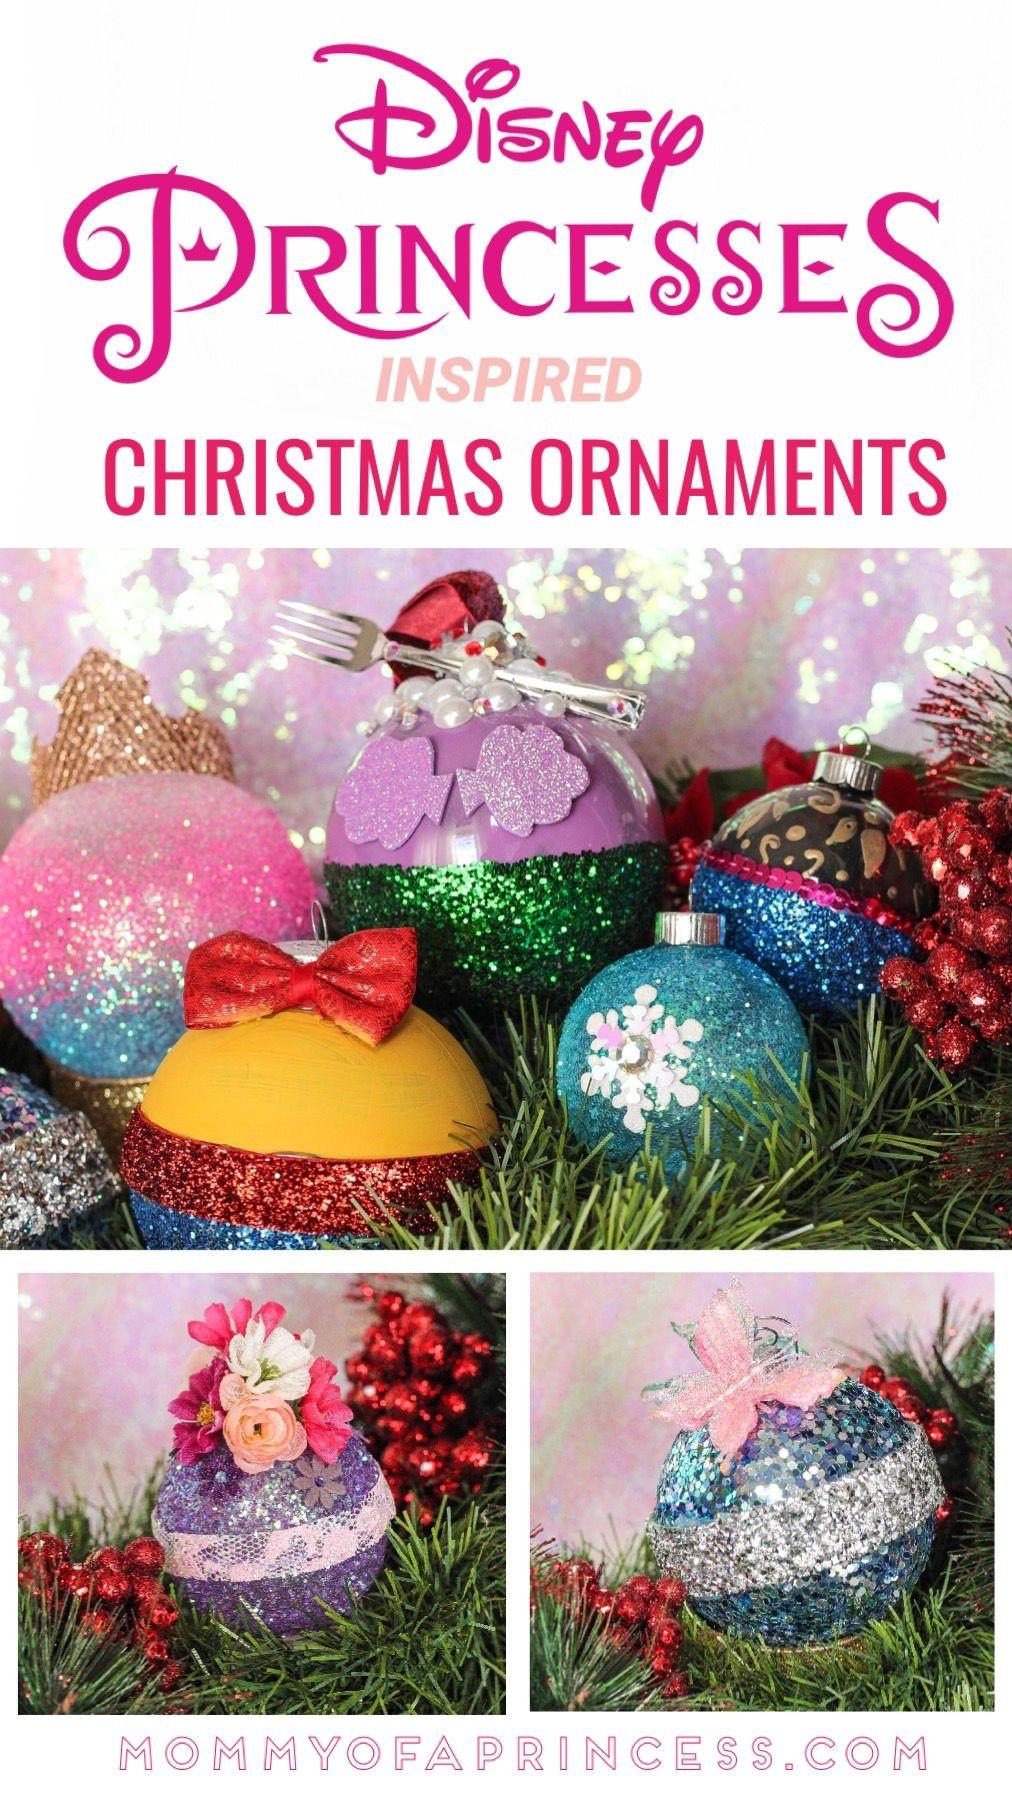 Easy Diy Disney Ornament For Christmas Inspired By Disney Princesses Disney Ornaments Diy Disney Christmas Diy Disney Christmas Crafts